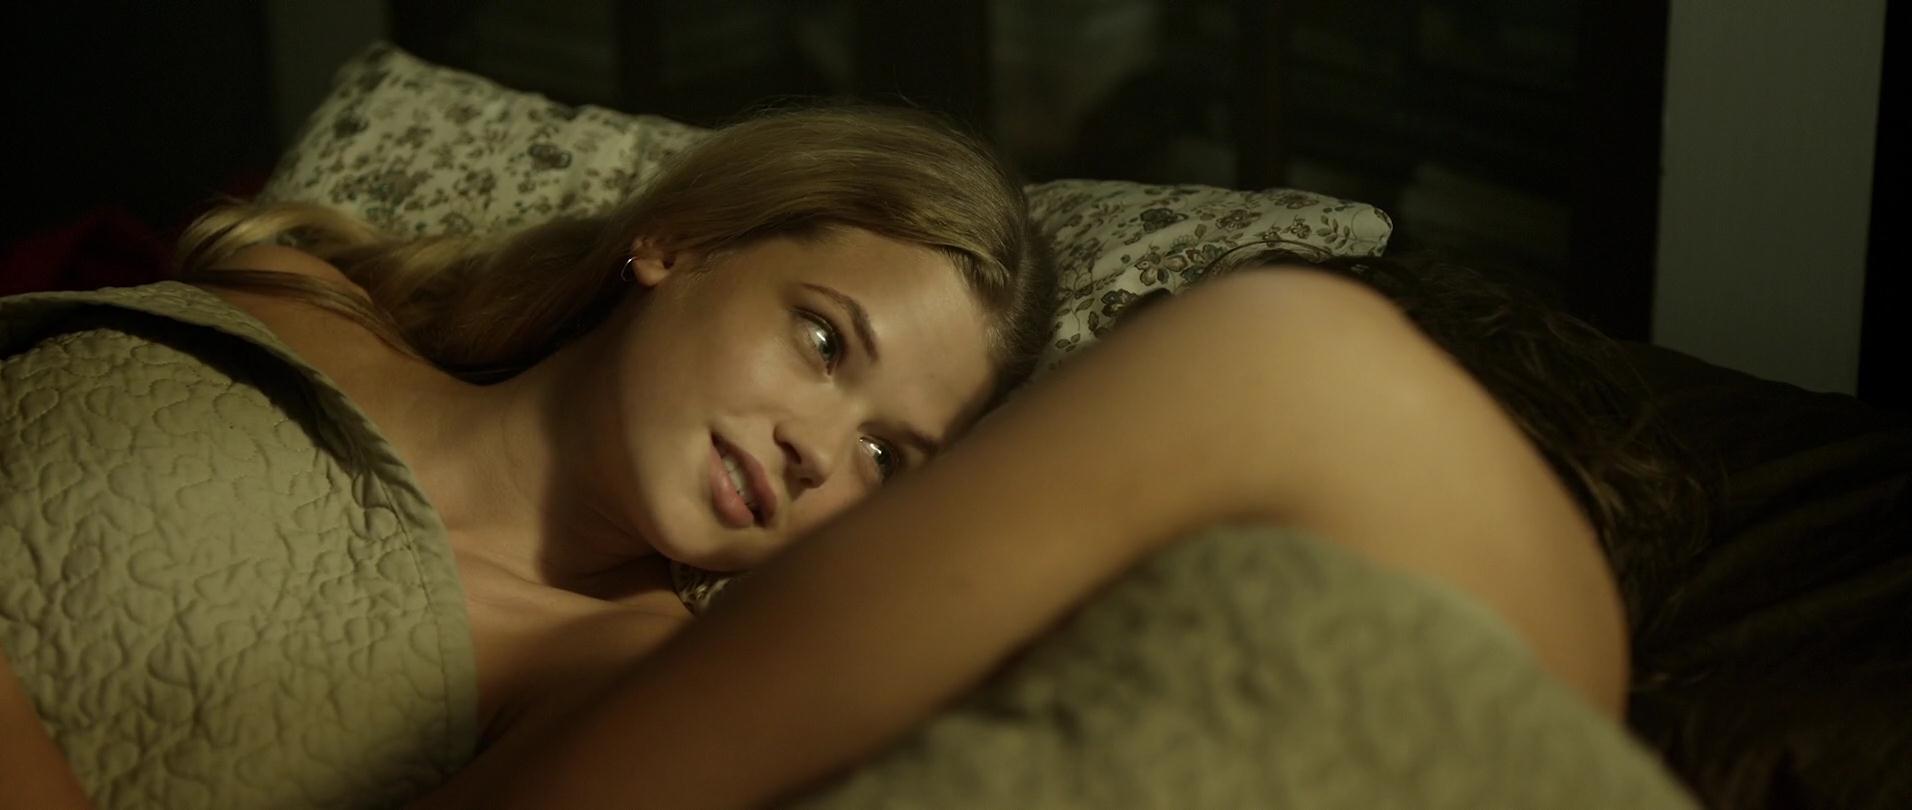 Gabriella wilde nude